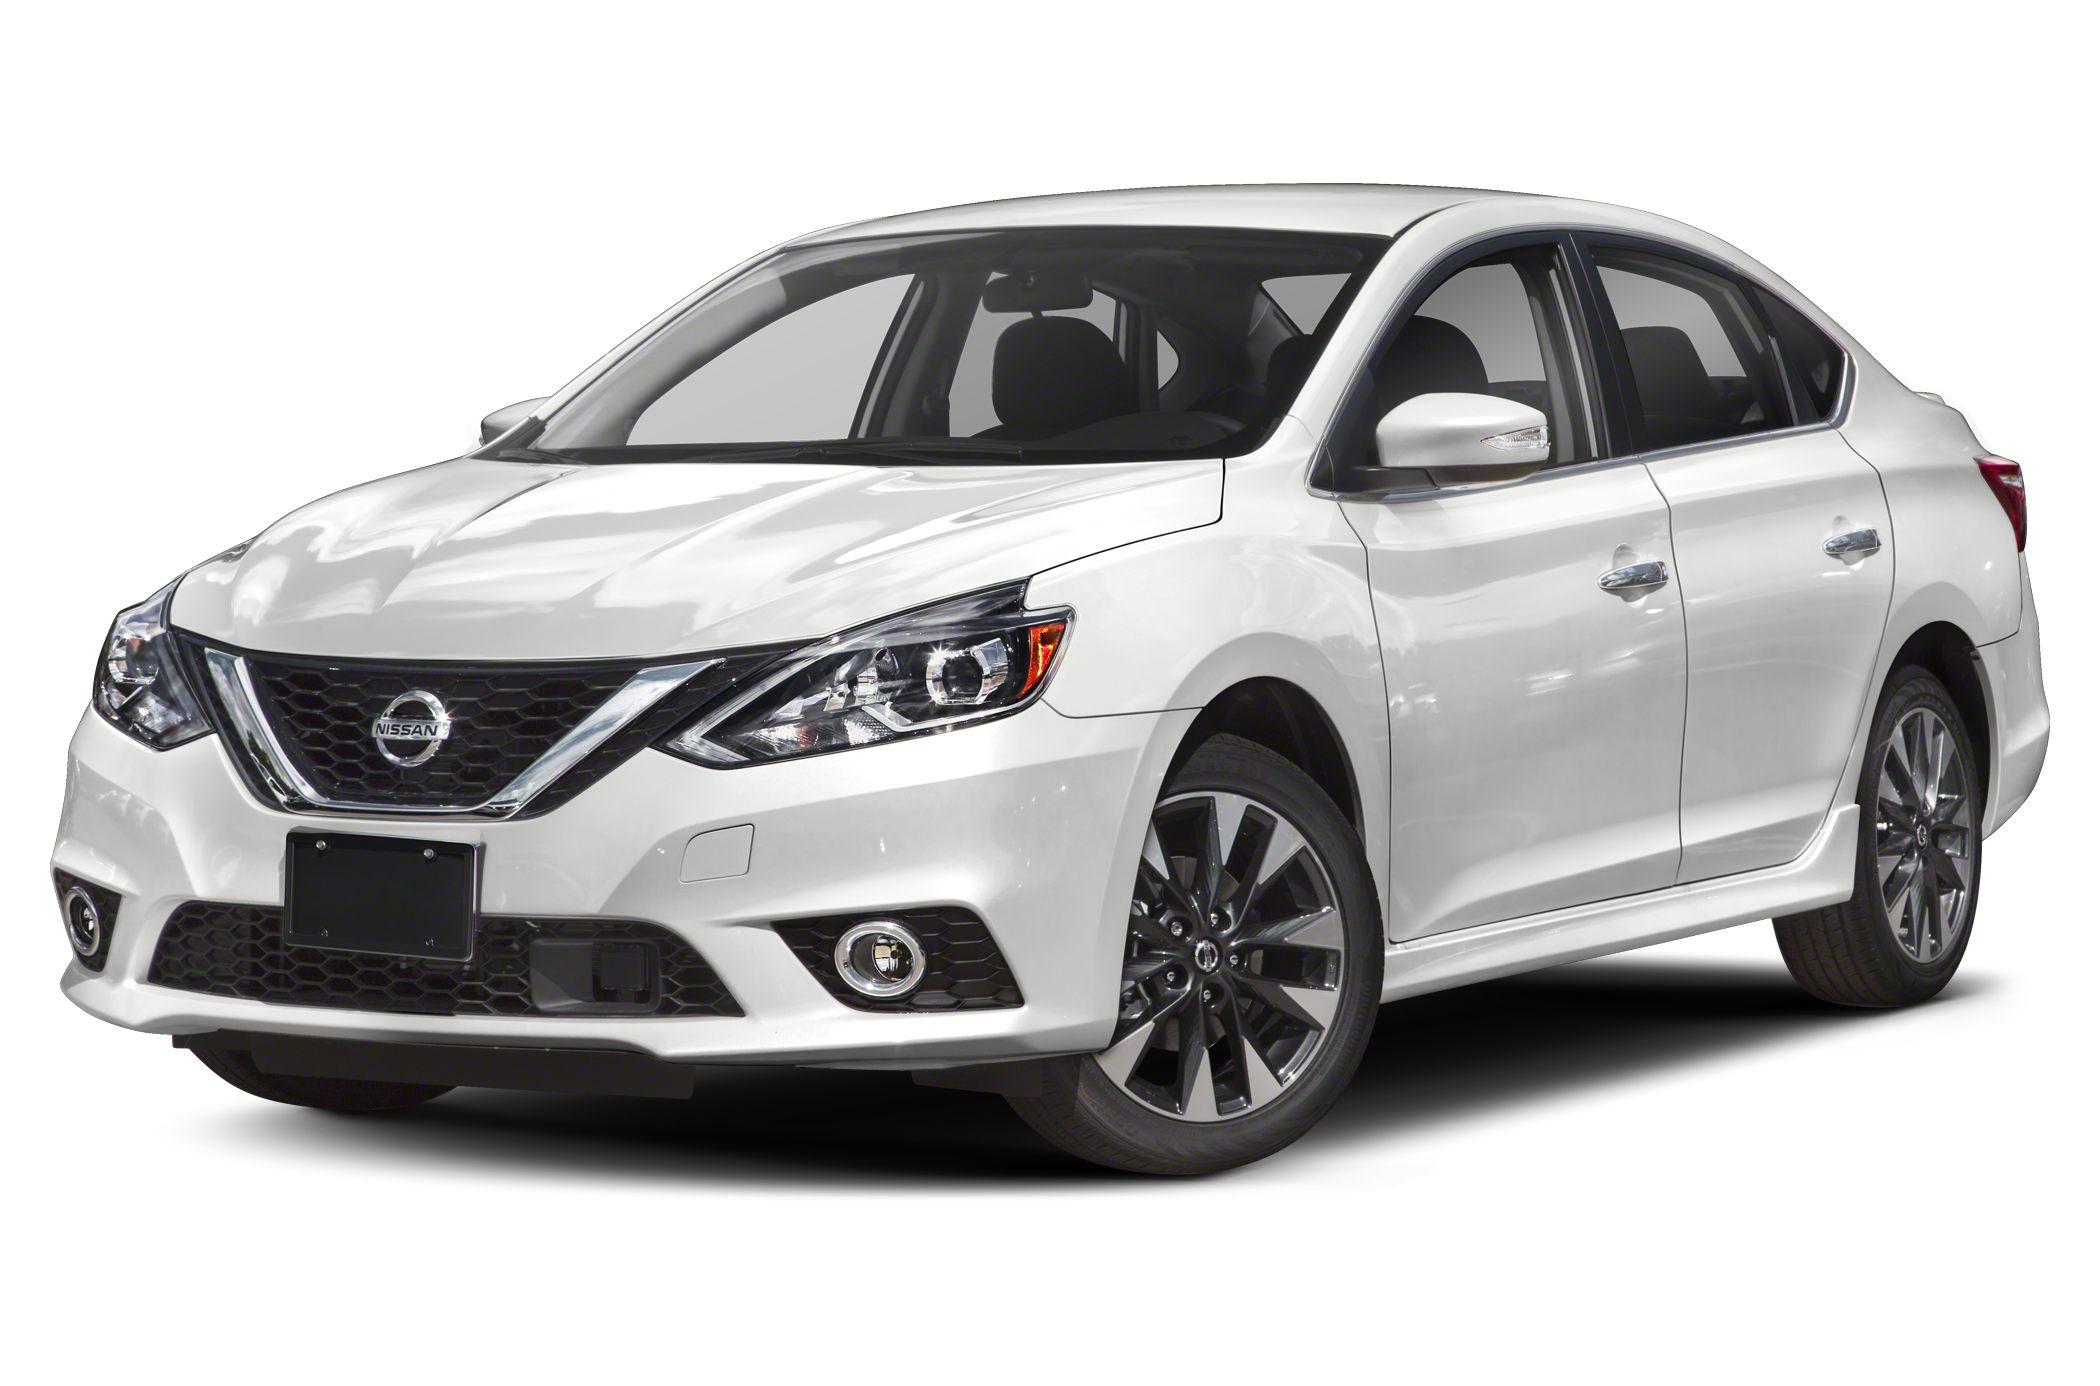 2019 Nissan Sentra Sr 4dr Sedan Specs And Prices